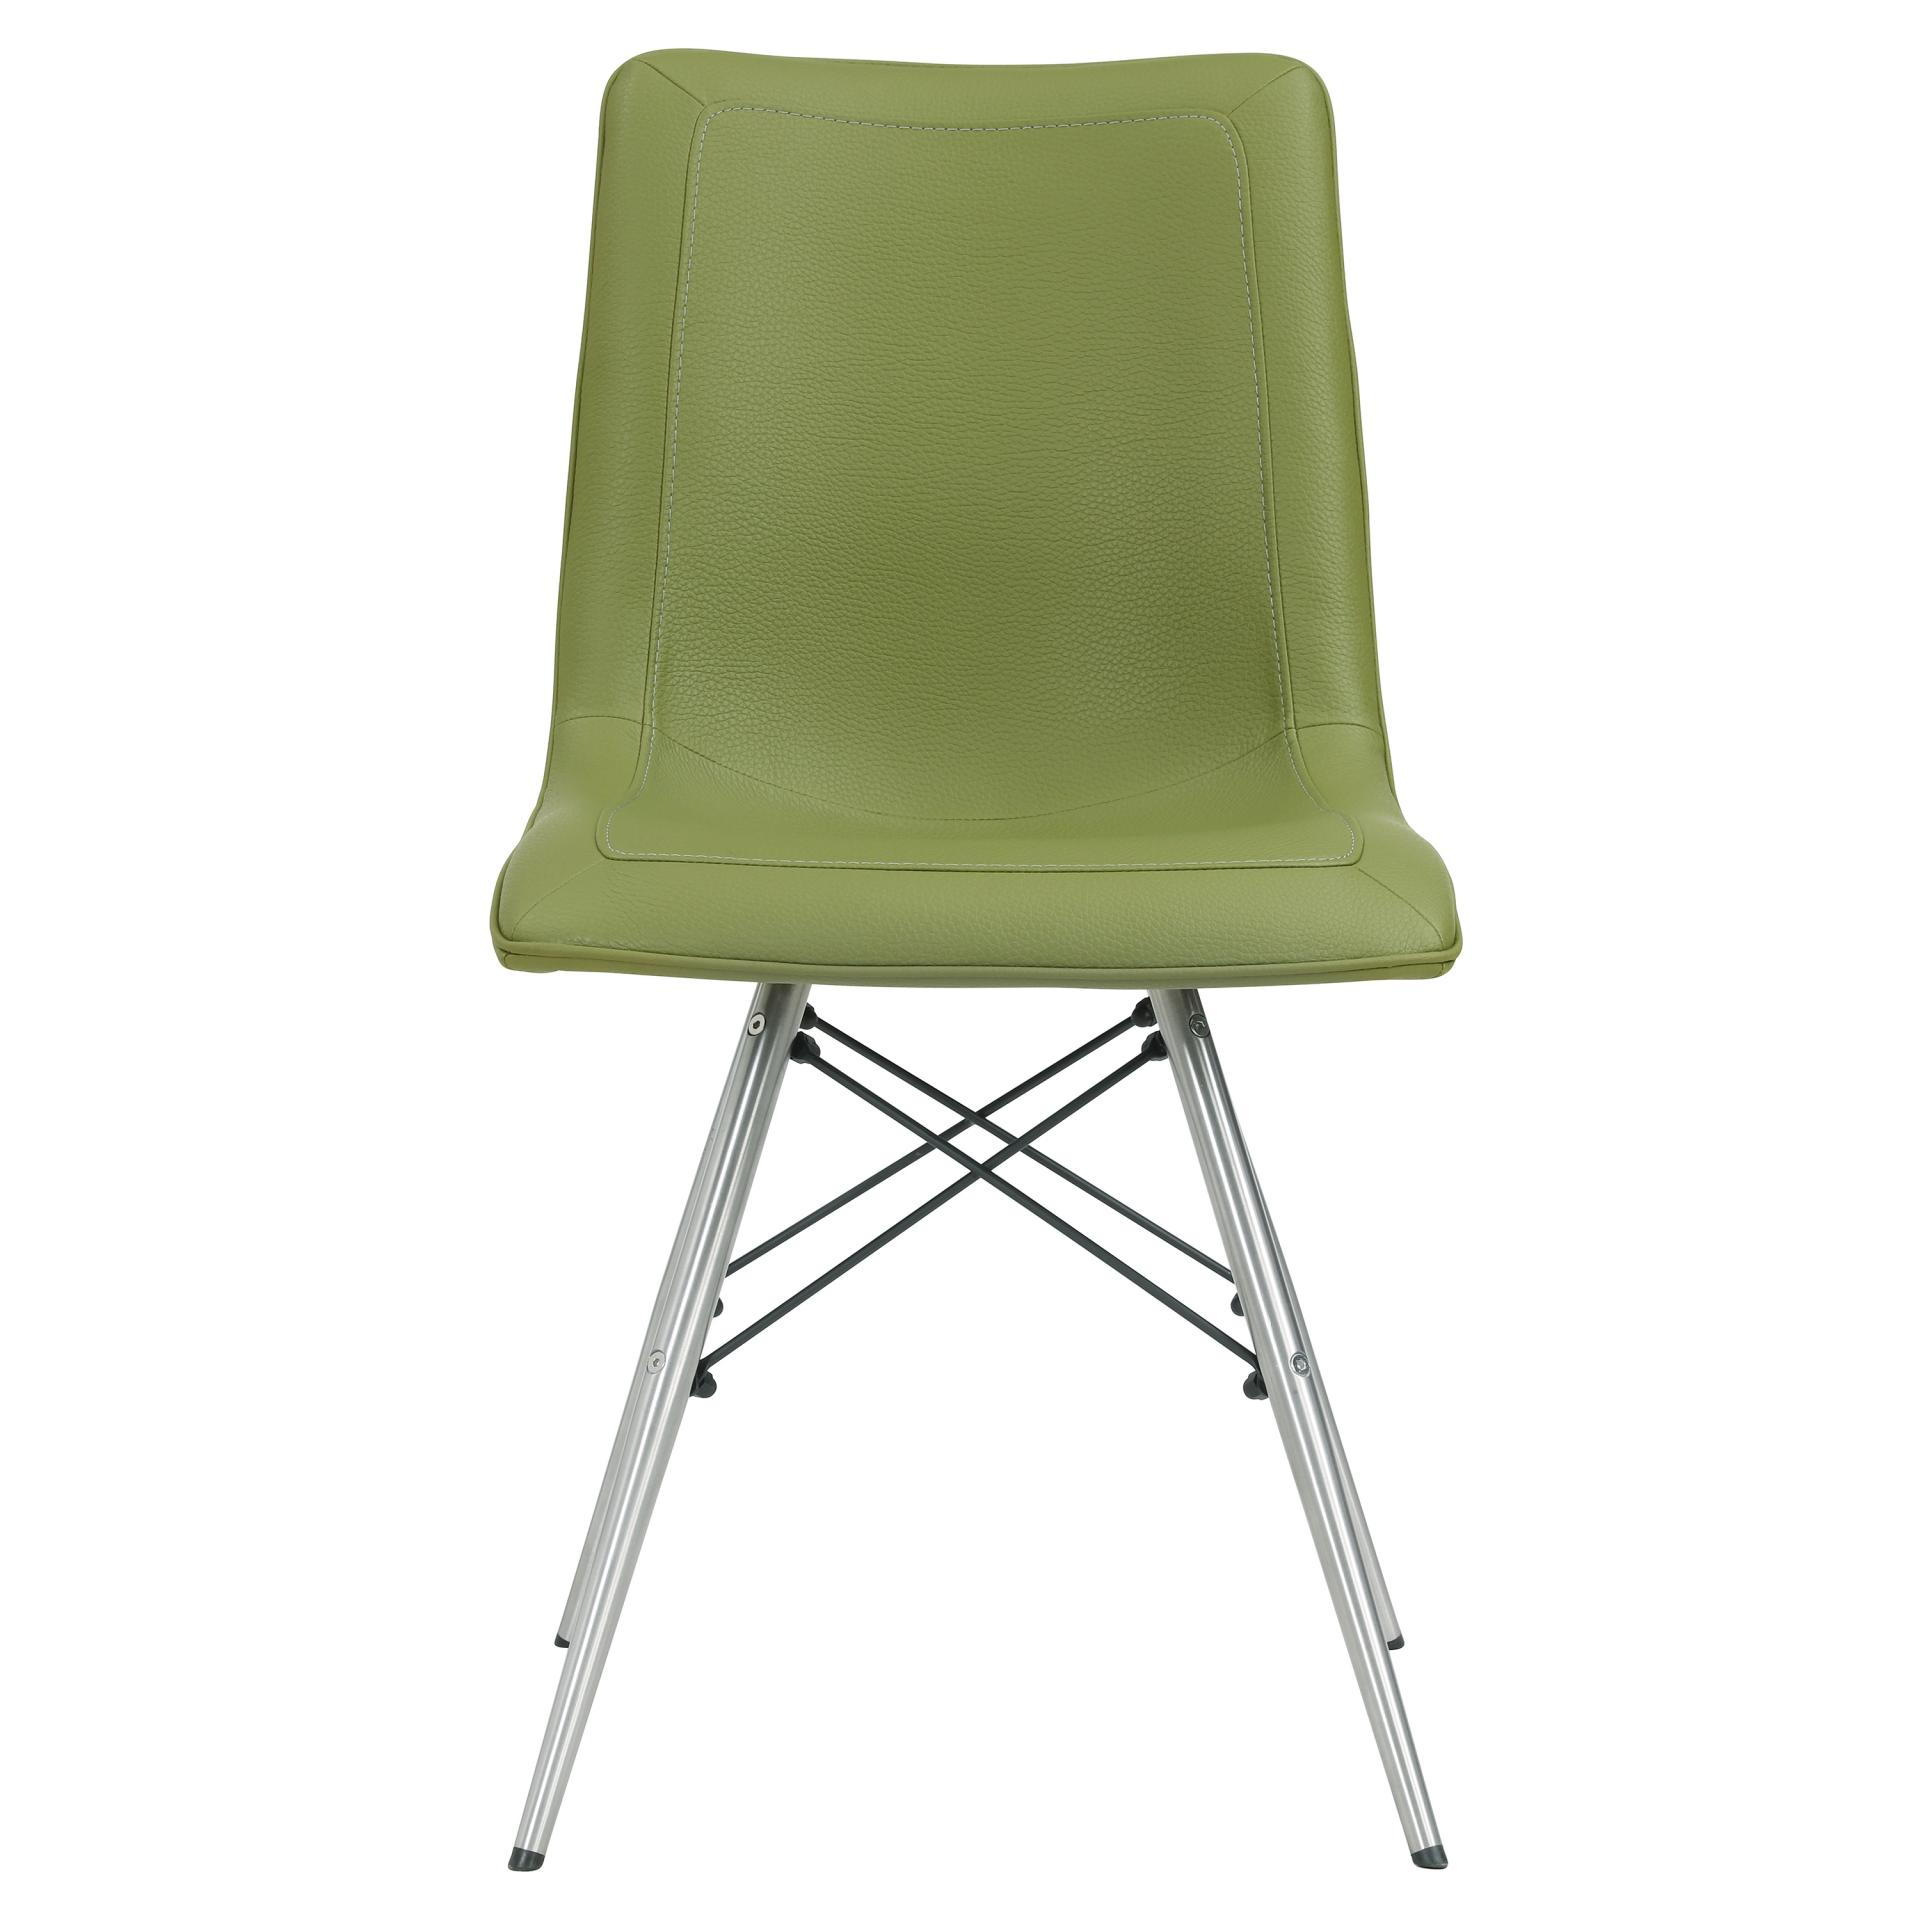 568236p Cs Ss Npd Home Furniture Wholesale Lifestyle